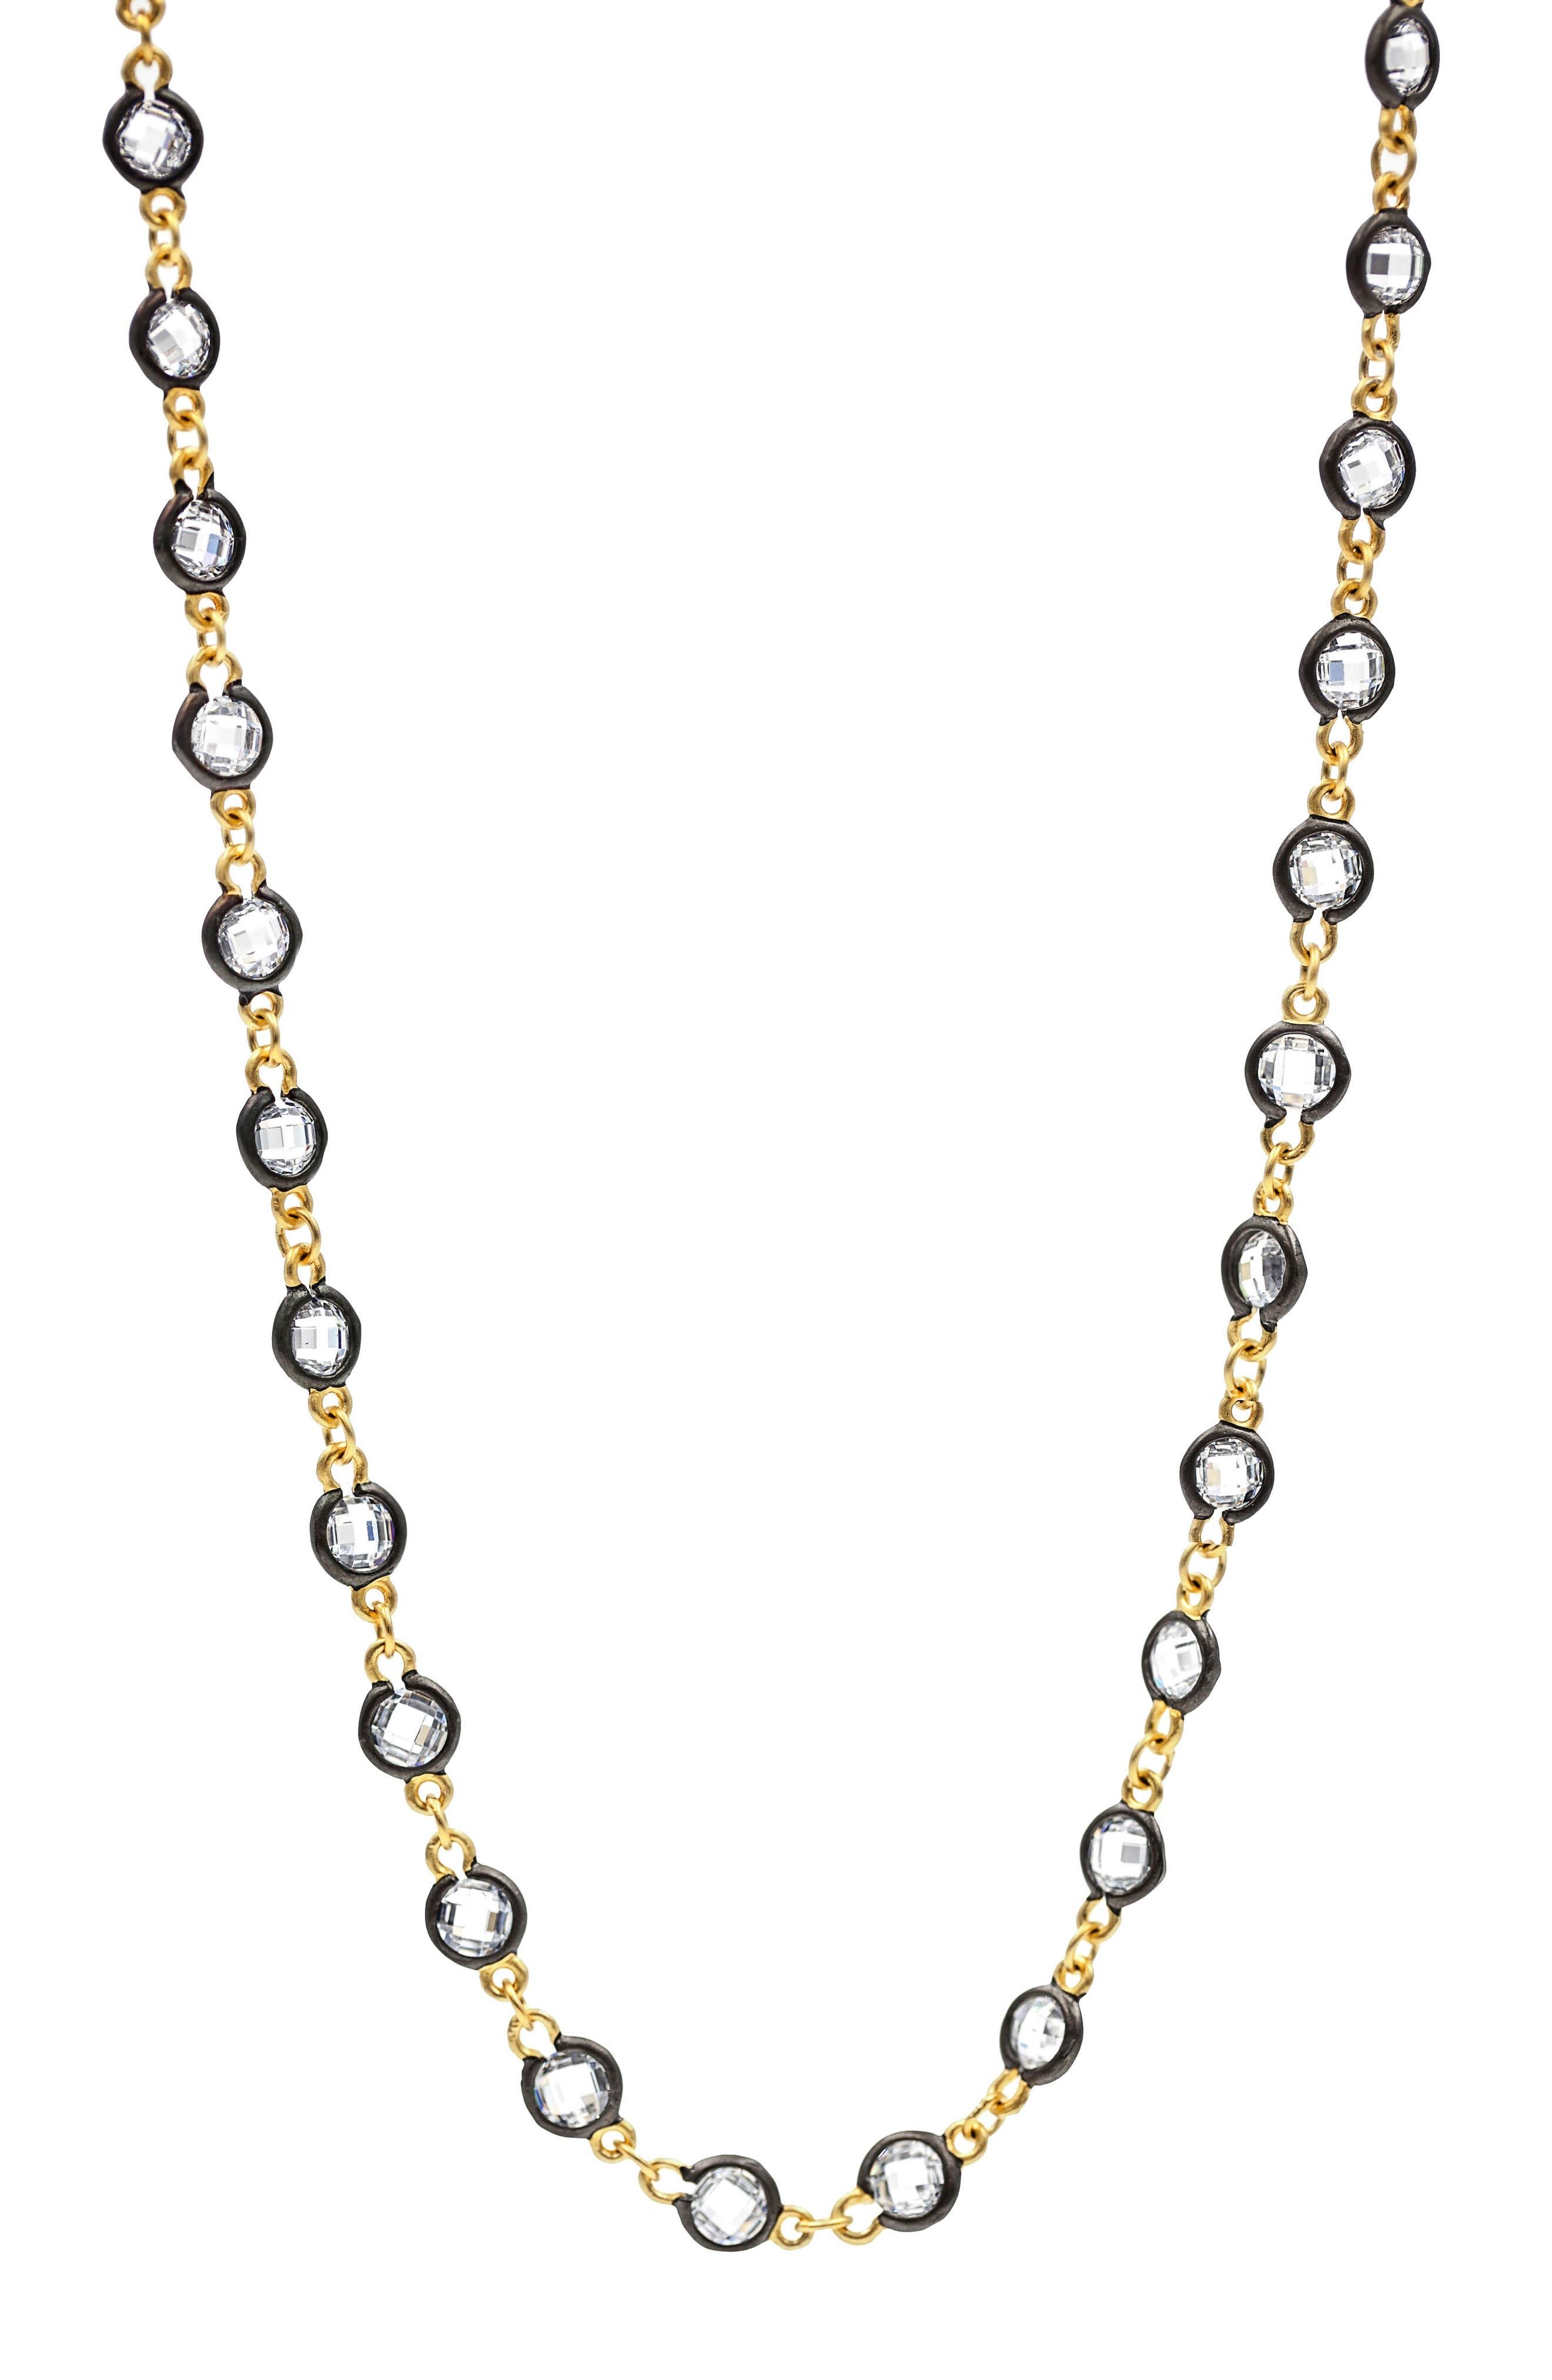 Signature Radiance Wrap Necklace,                             Alternate thumbnail 2, color,                             710